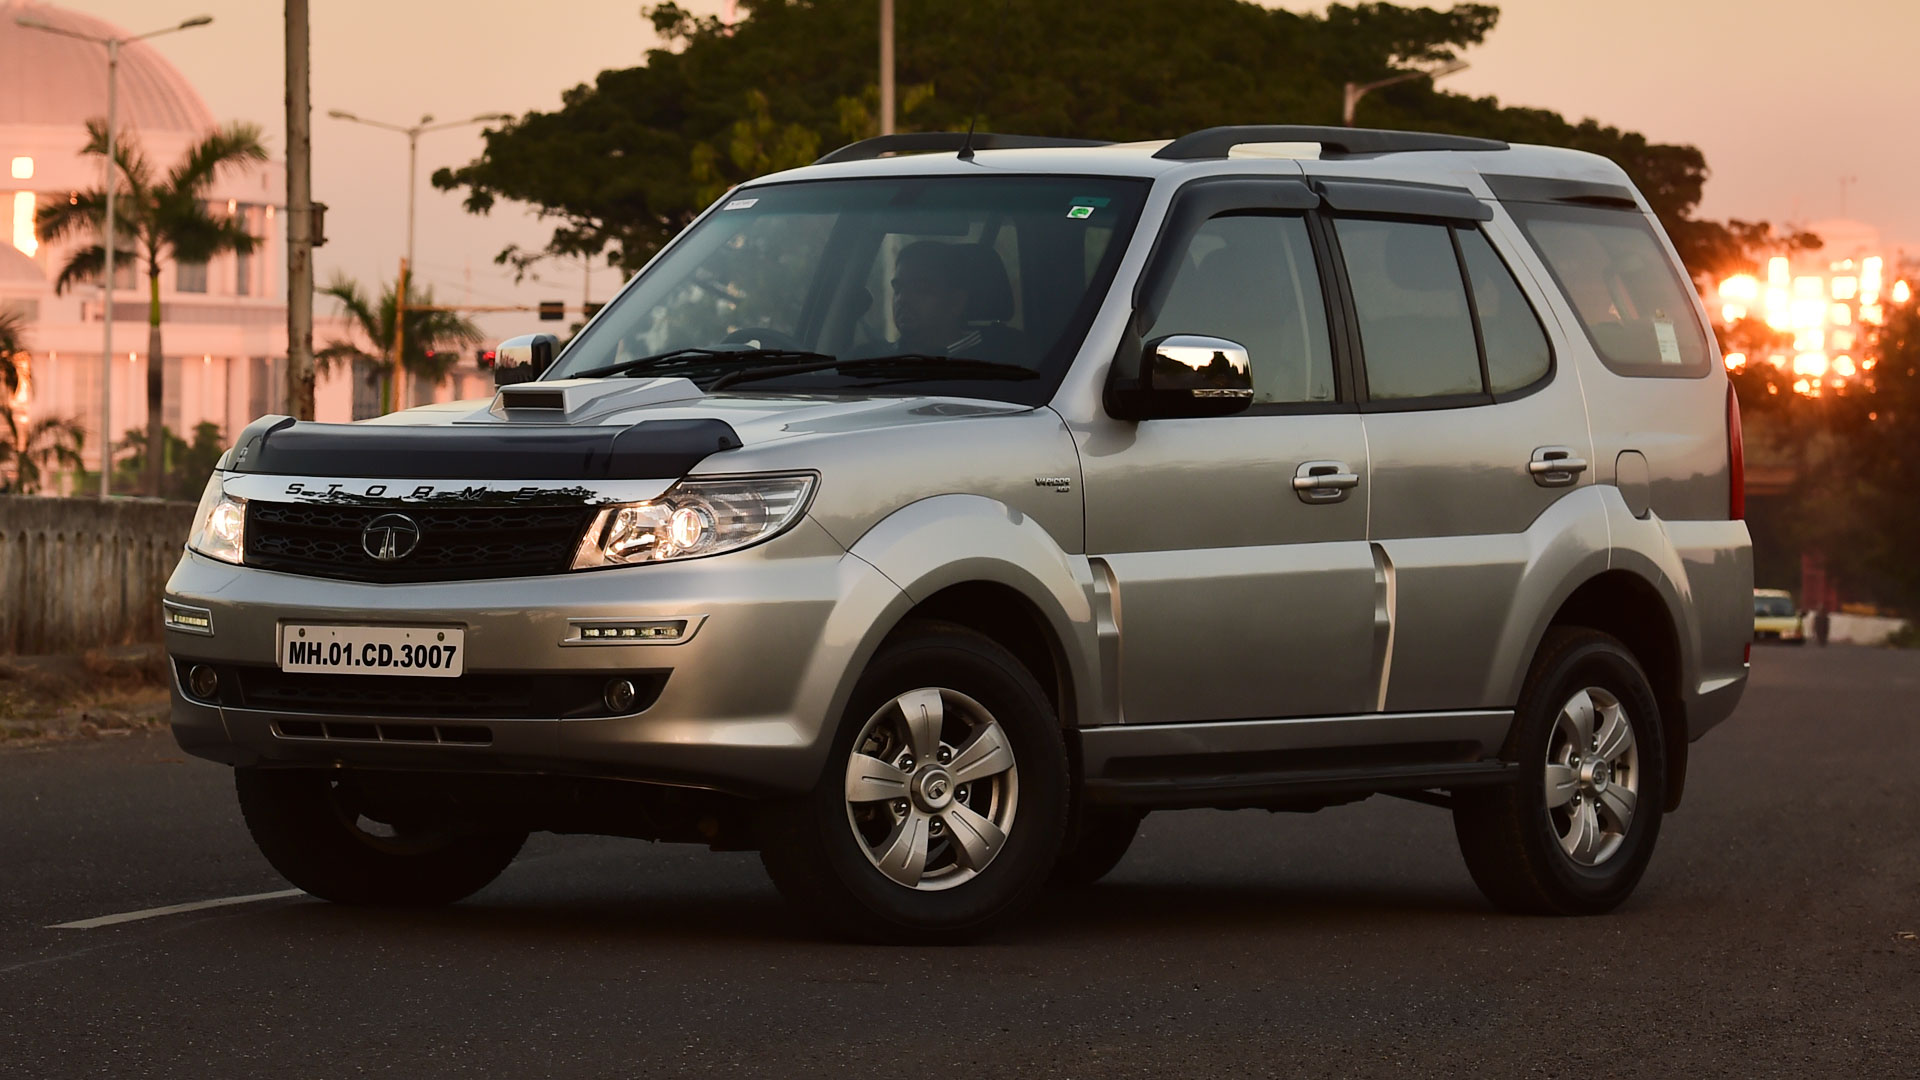 Tata Safari Storme 2016 Price Mileage Reviews Specification Gallery Overdrive